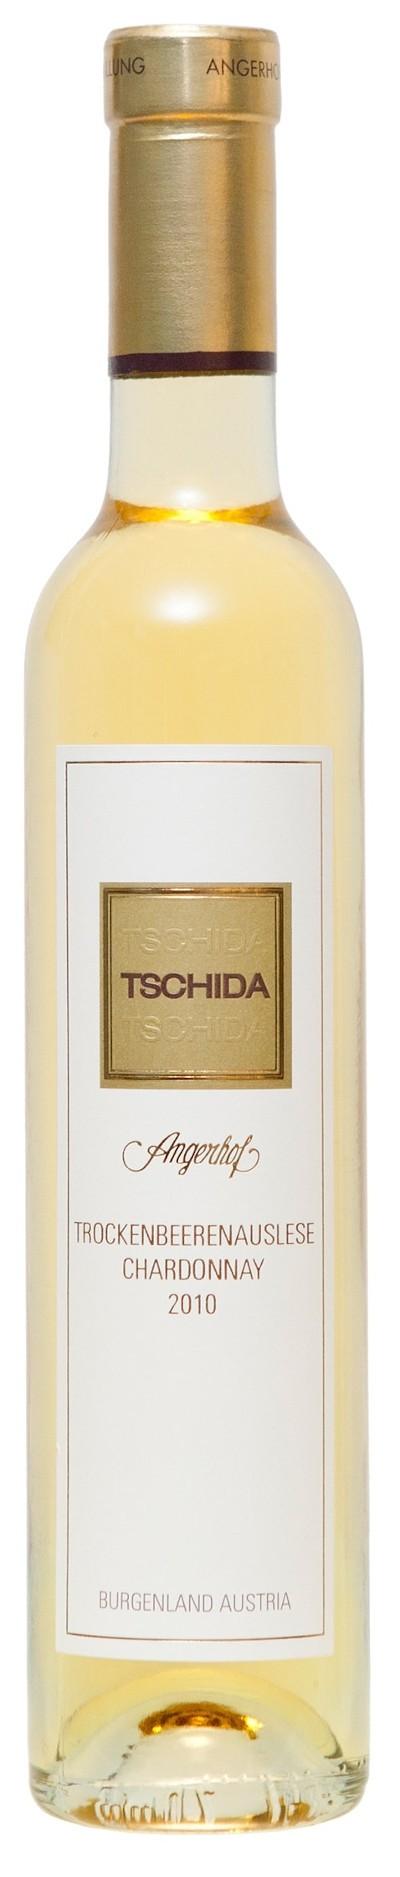 Angerhof Tschida - Rarität Chardonnay Trockenbeerenauslese, 2010